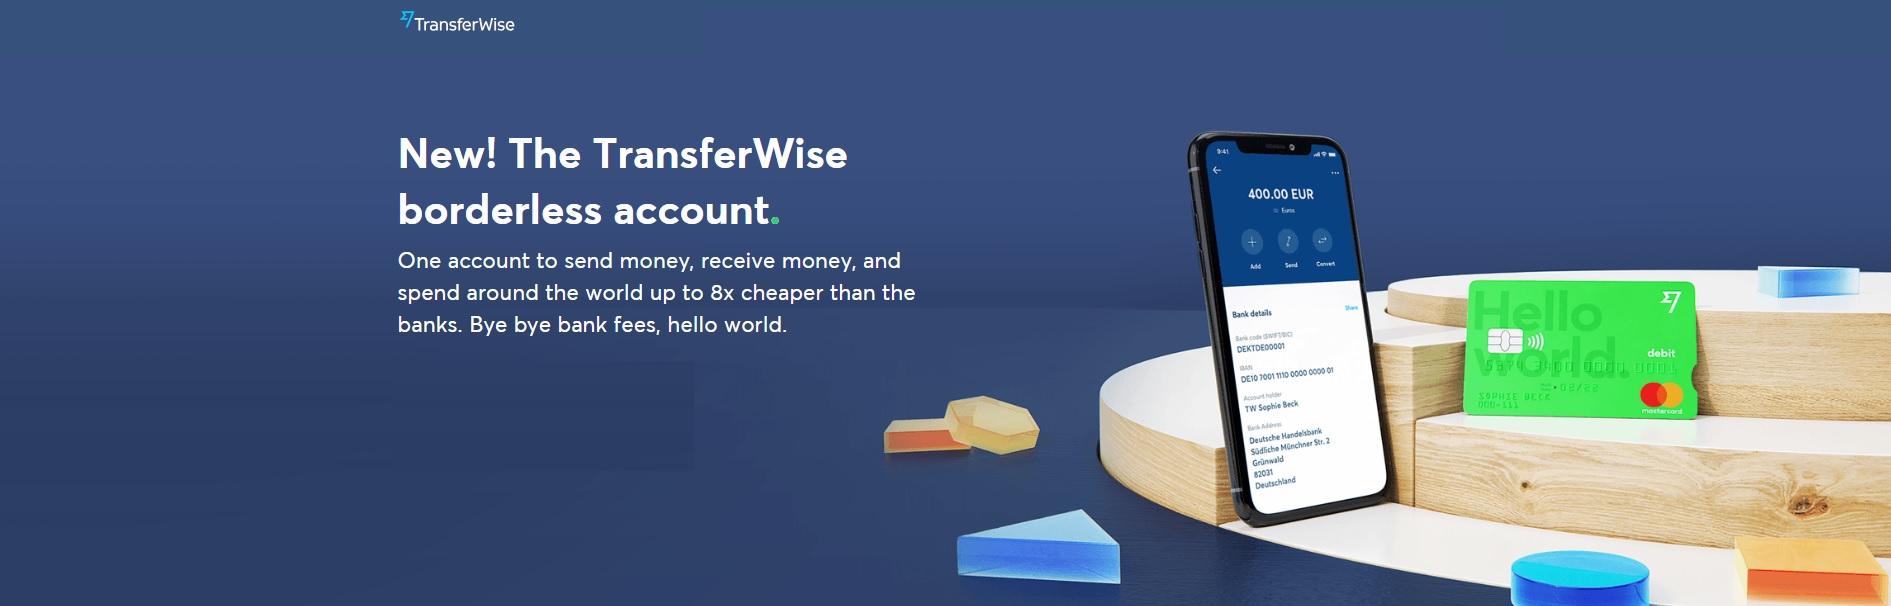 "TransferWise-חשבון בנק בחו""ל"